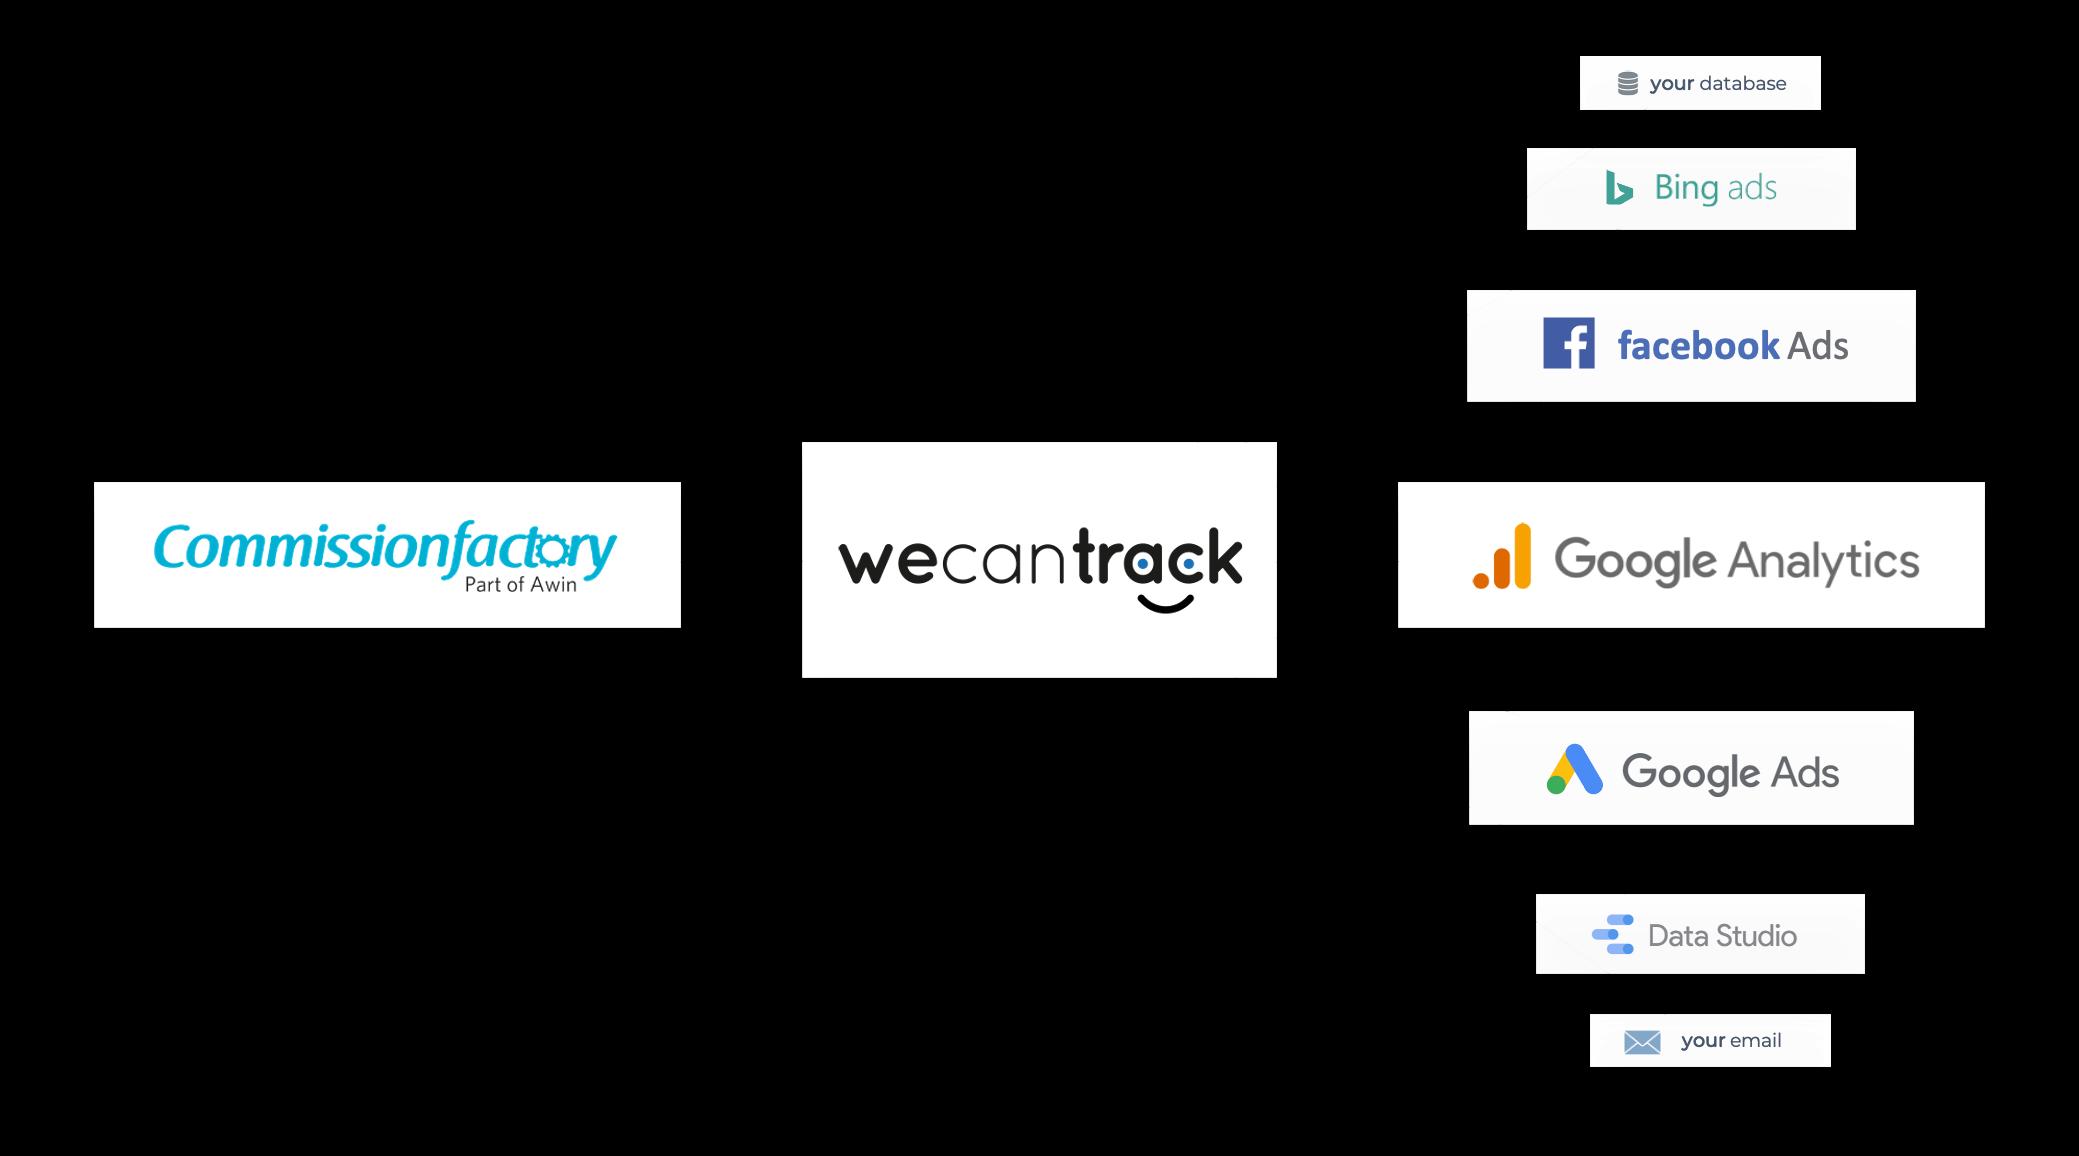 commission-factory-affiliate-conversion-integration-via-api